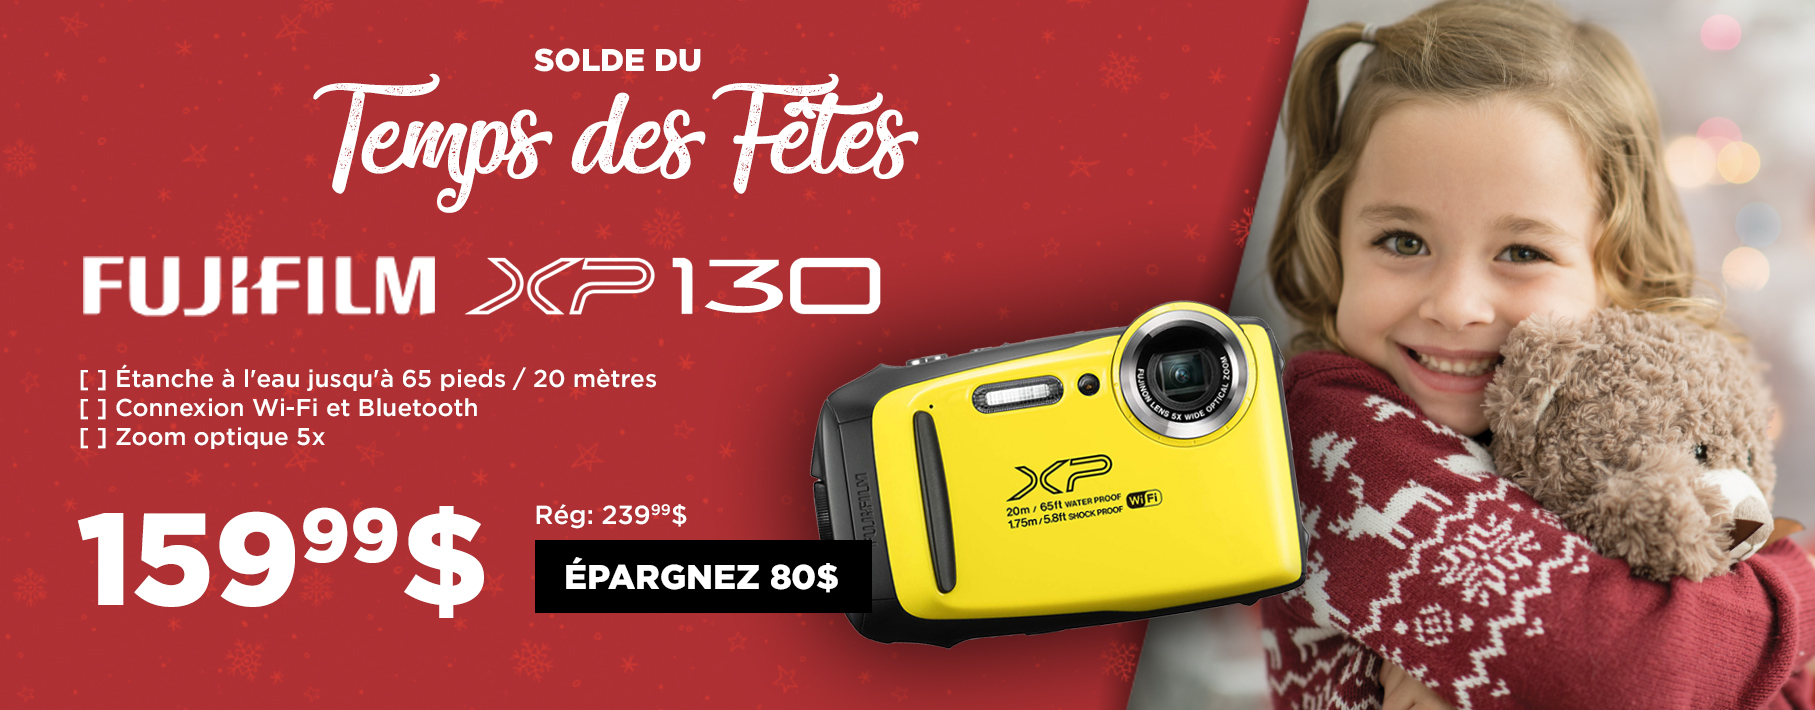 Fetes XP130